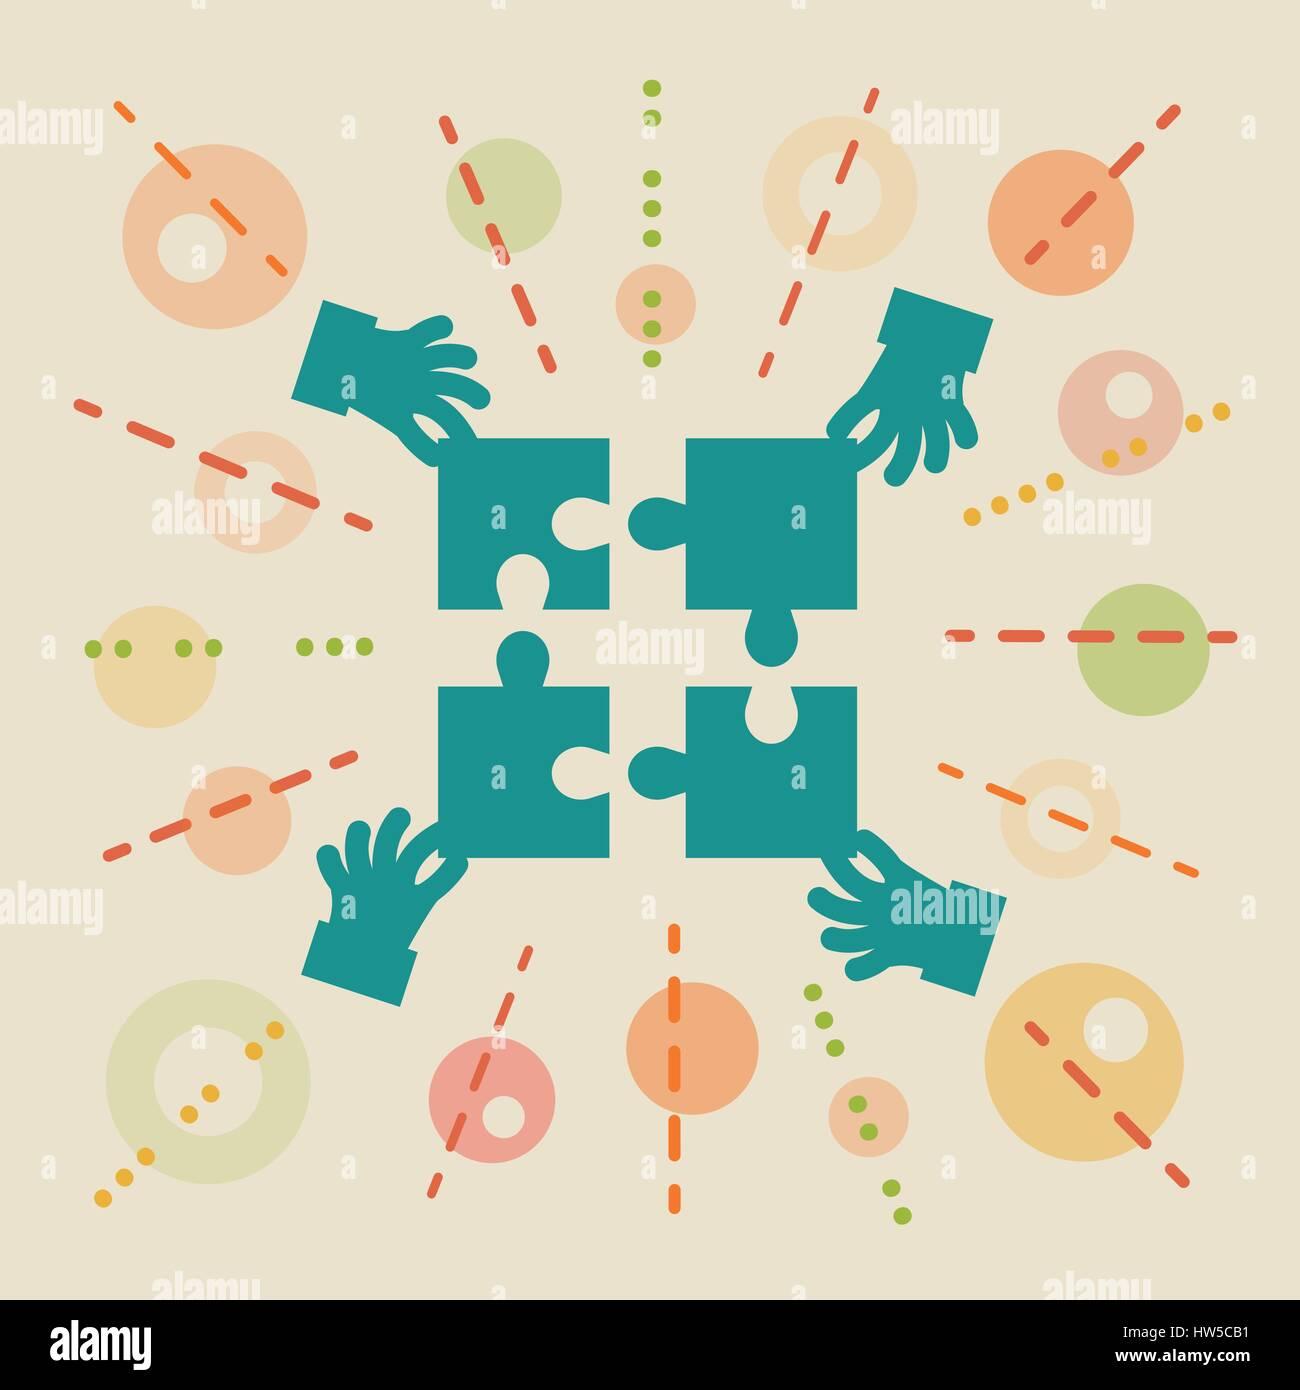 Teamarbeit. Konzept-Geschäft-Abbildung Stock Vektor